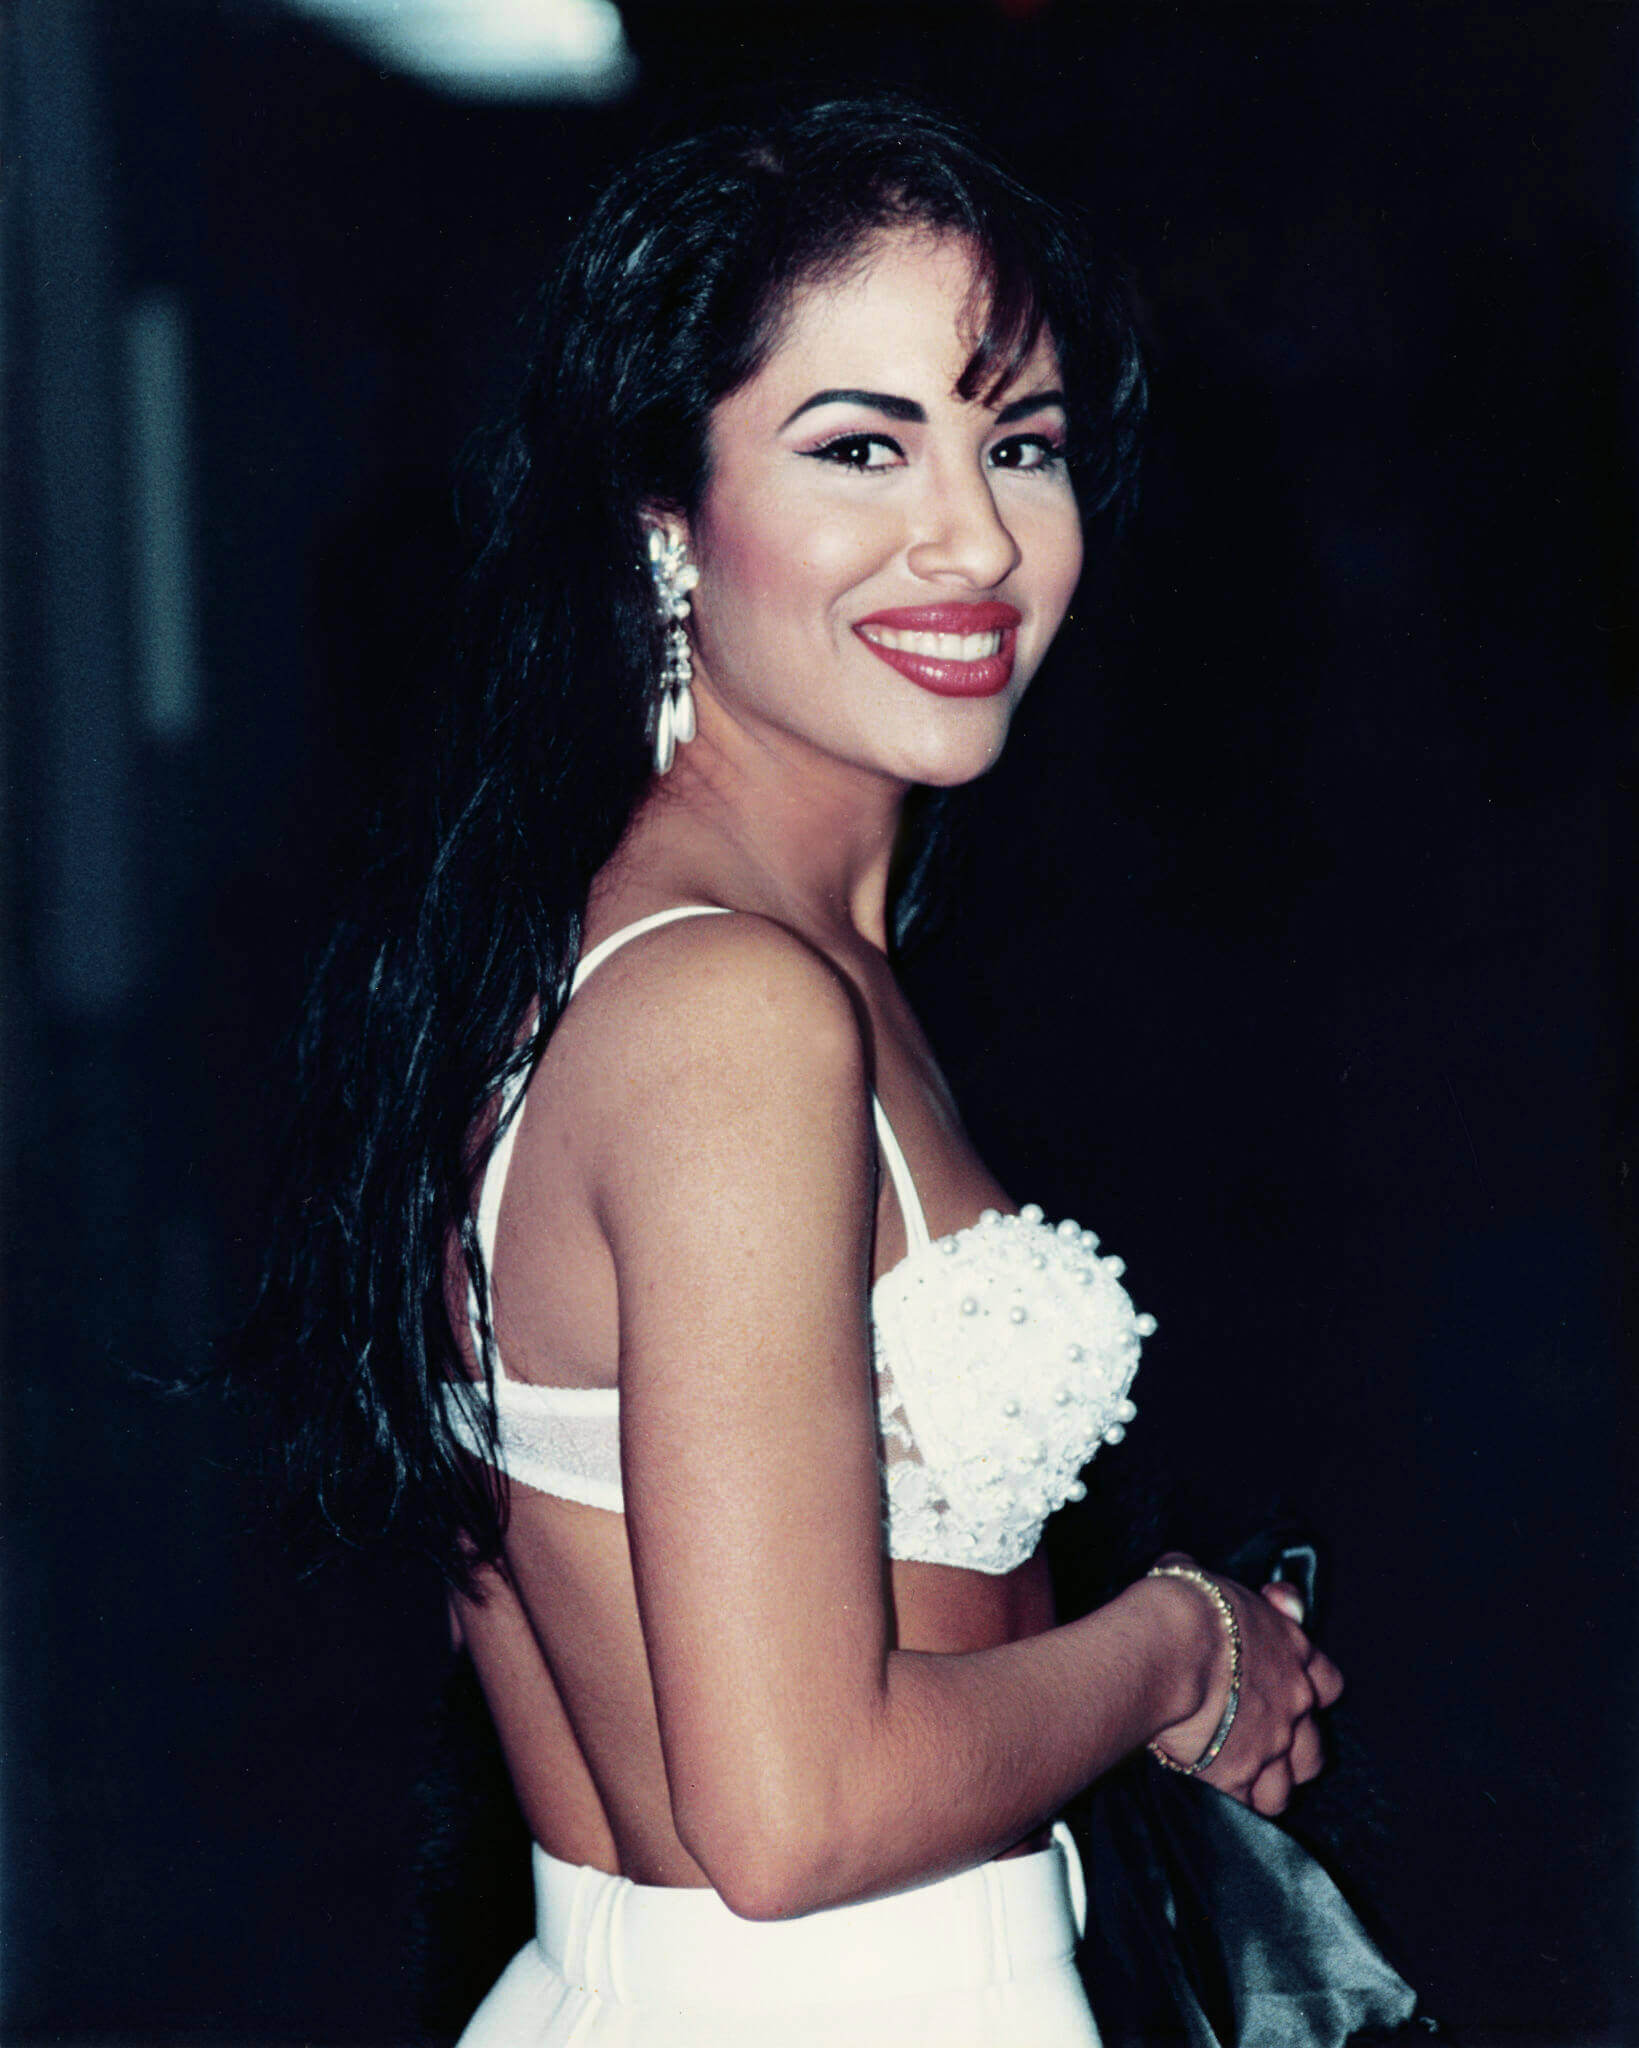 ¿Quién mató a Selena y porque?